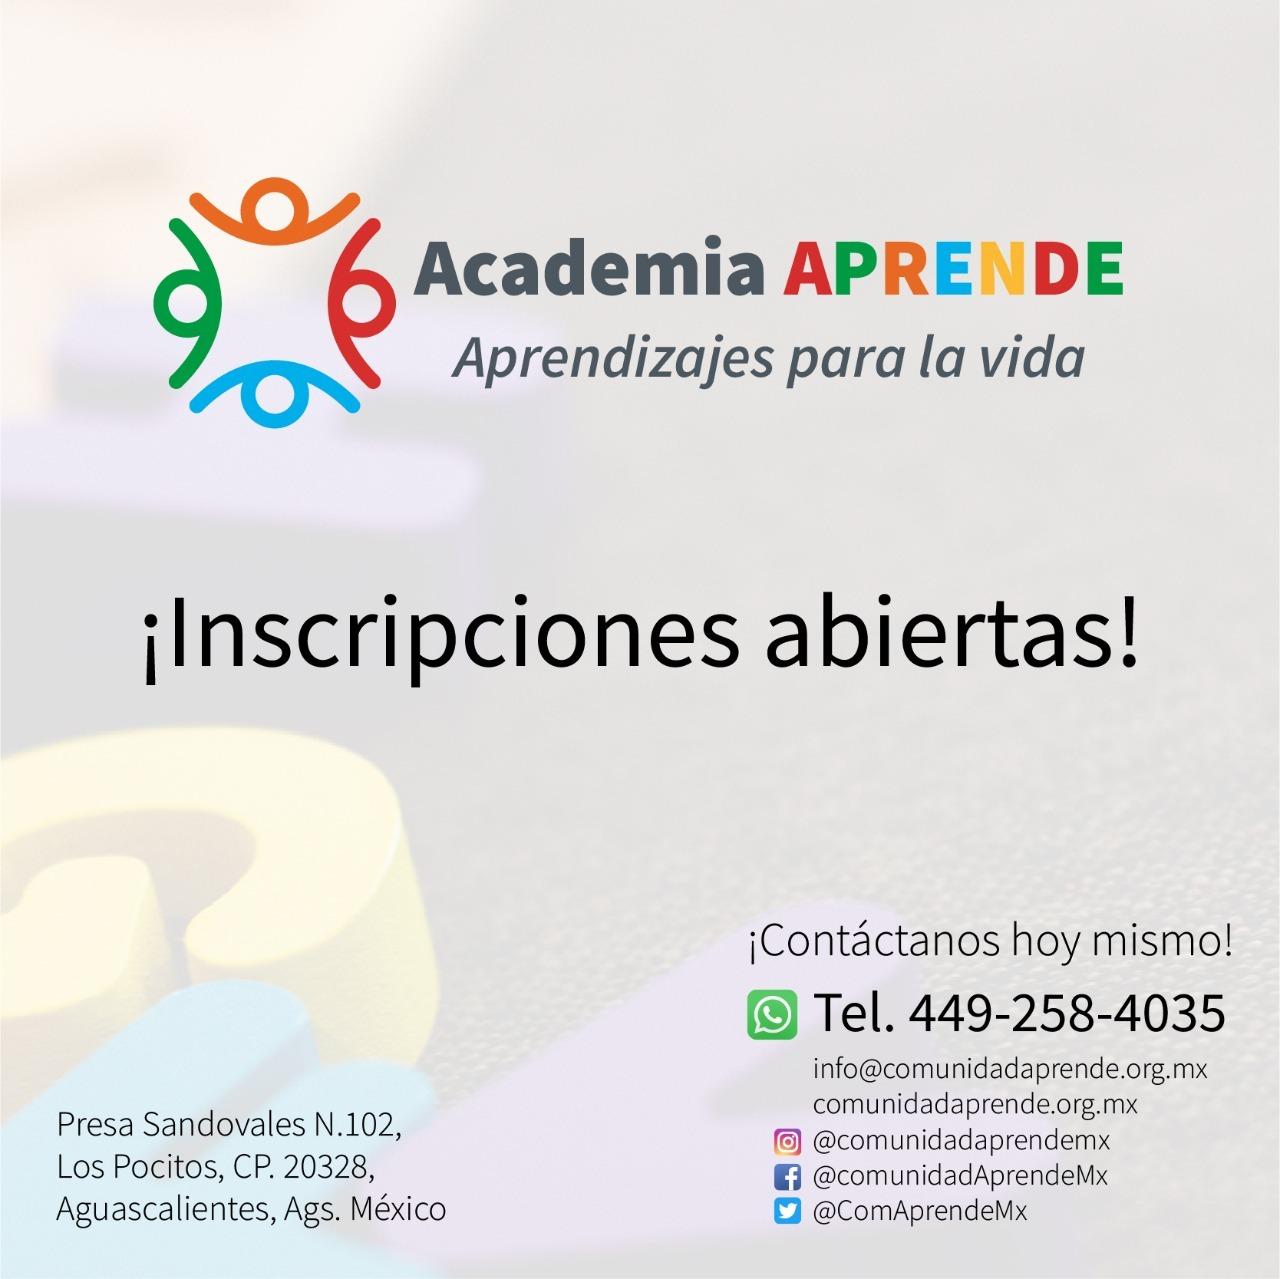 Academia Aprende